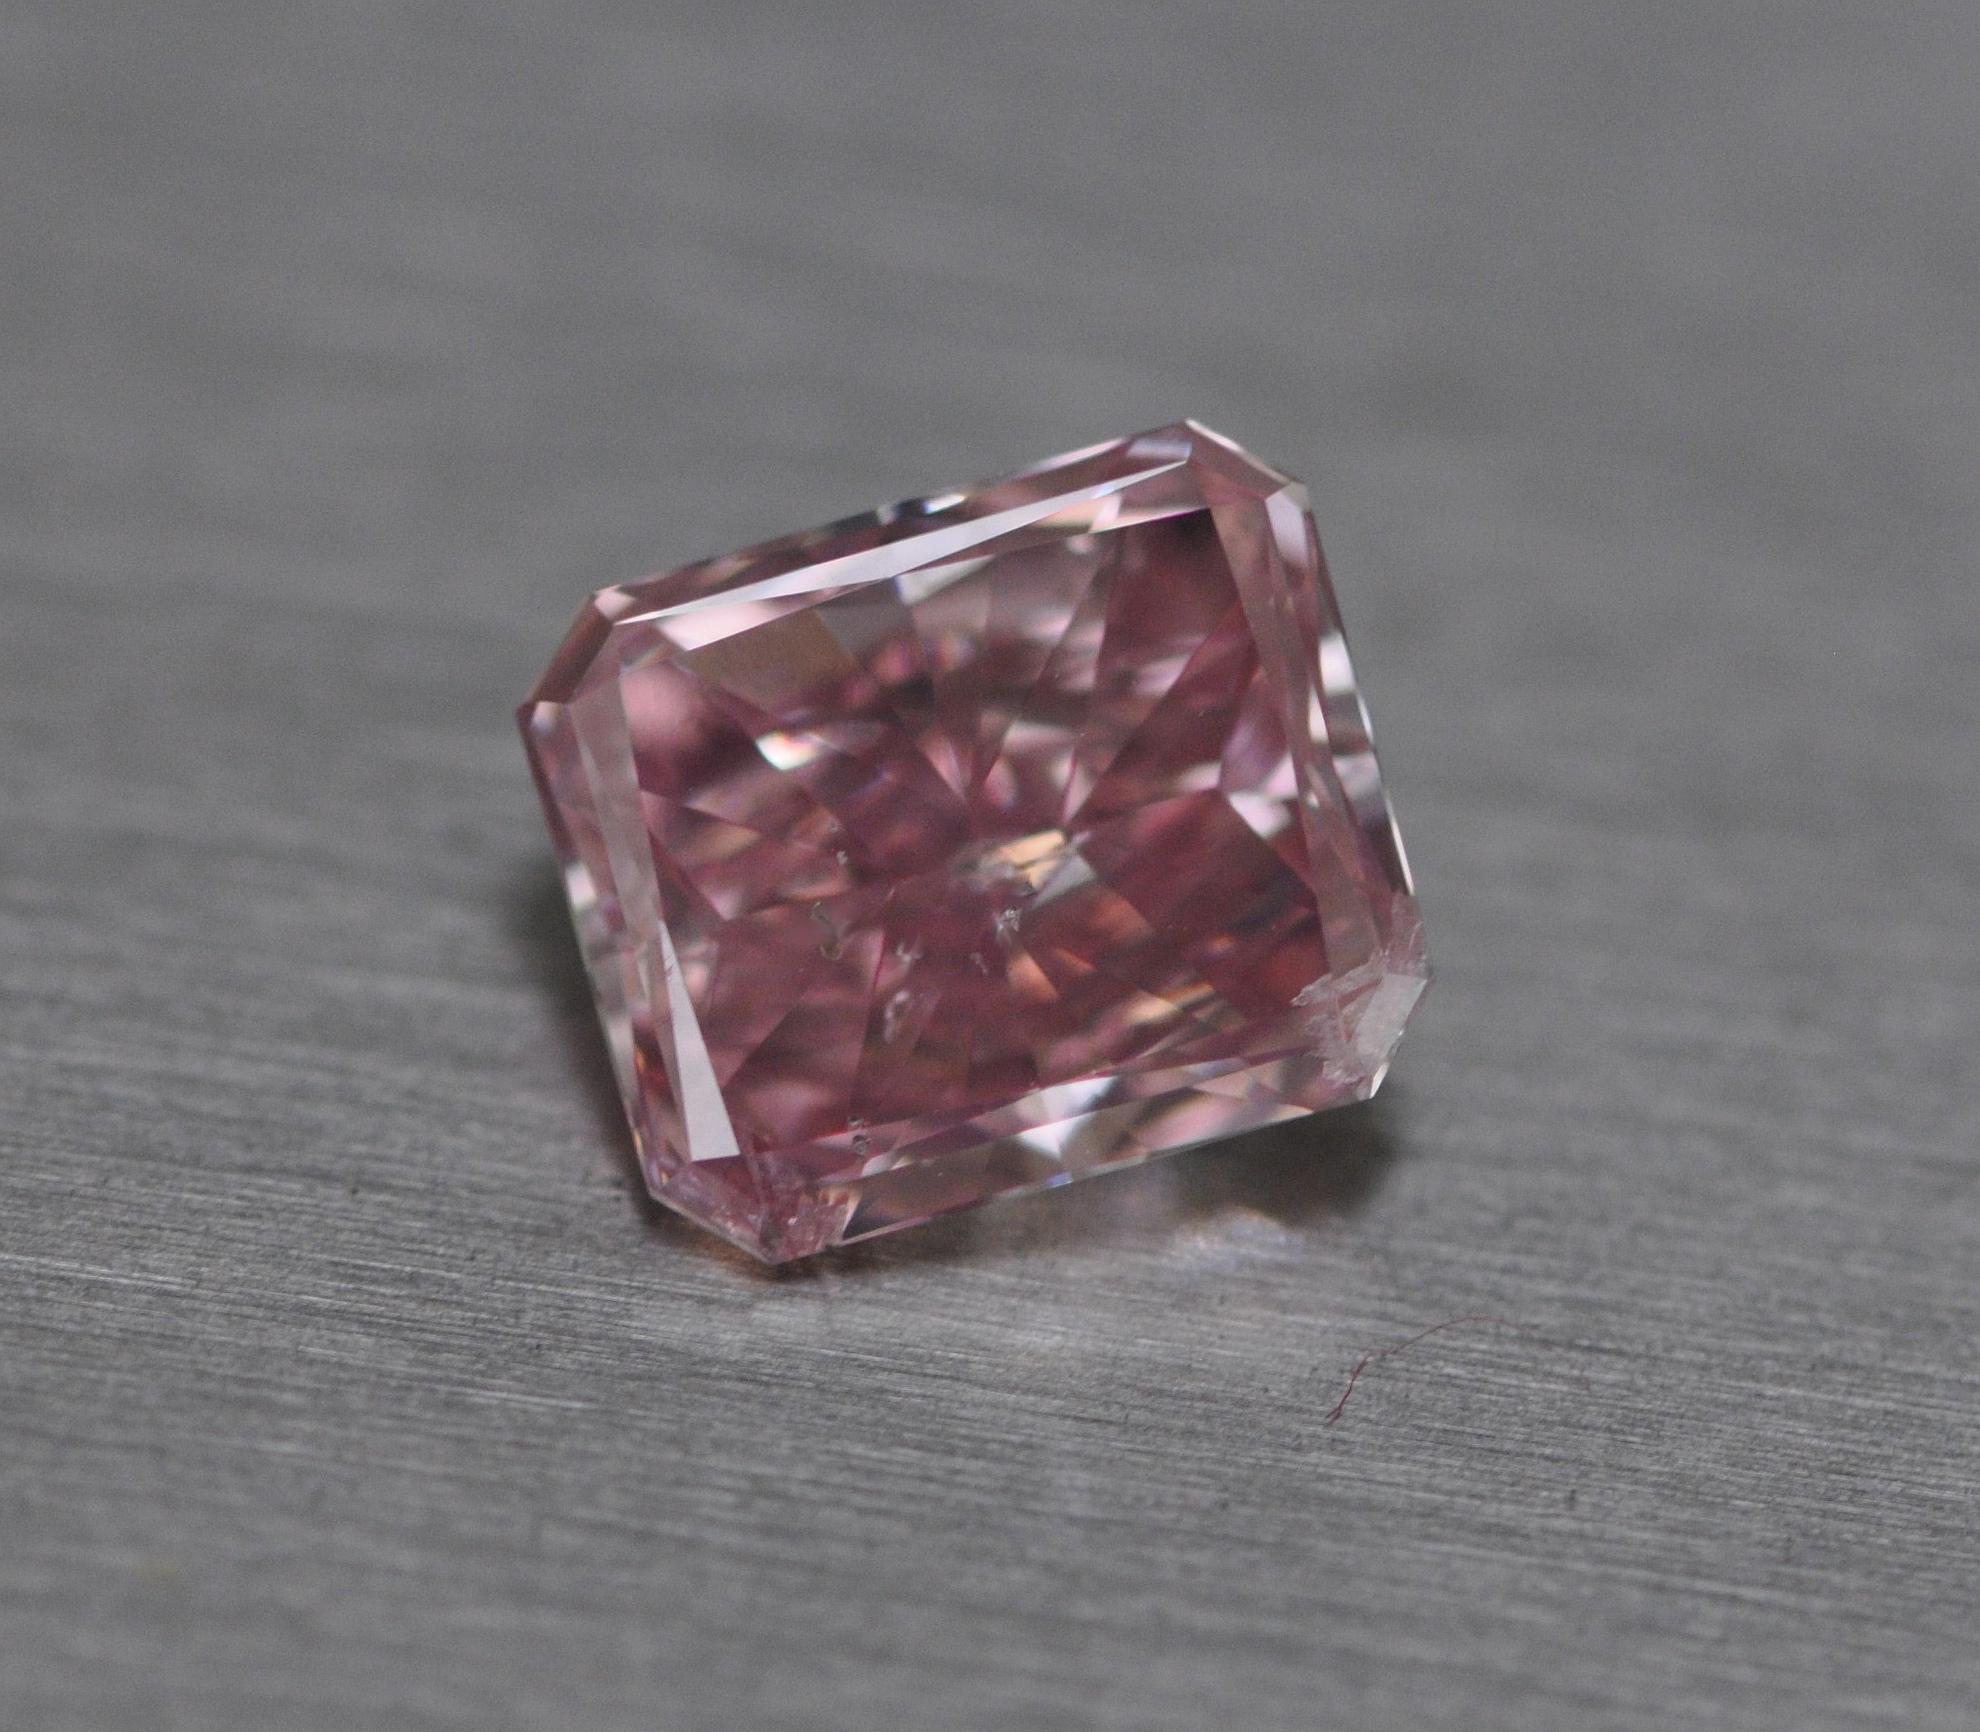 1.62ct Intense Pink Diamond